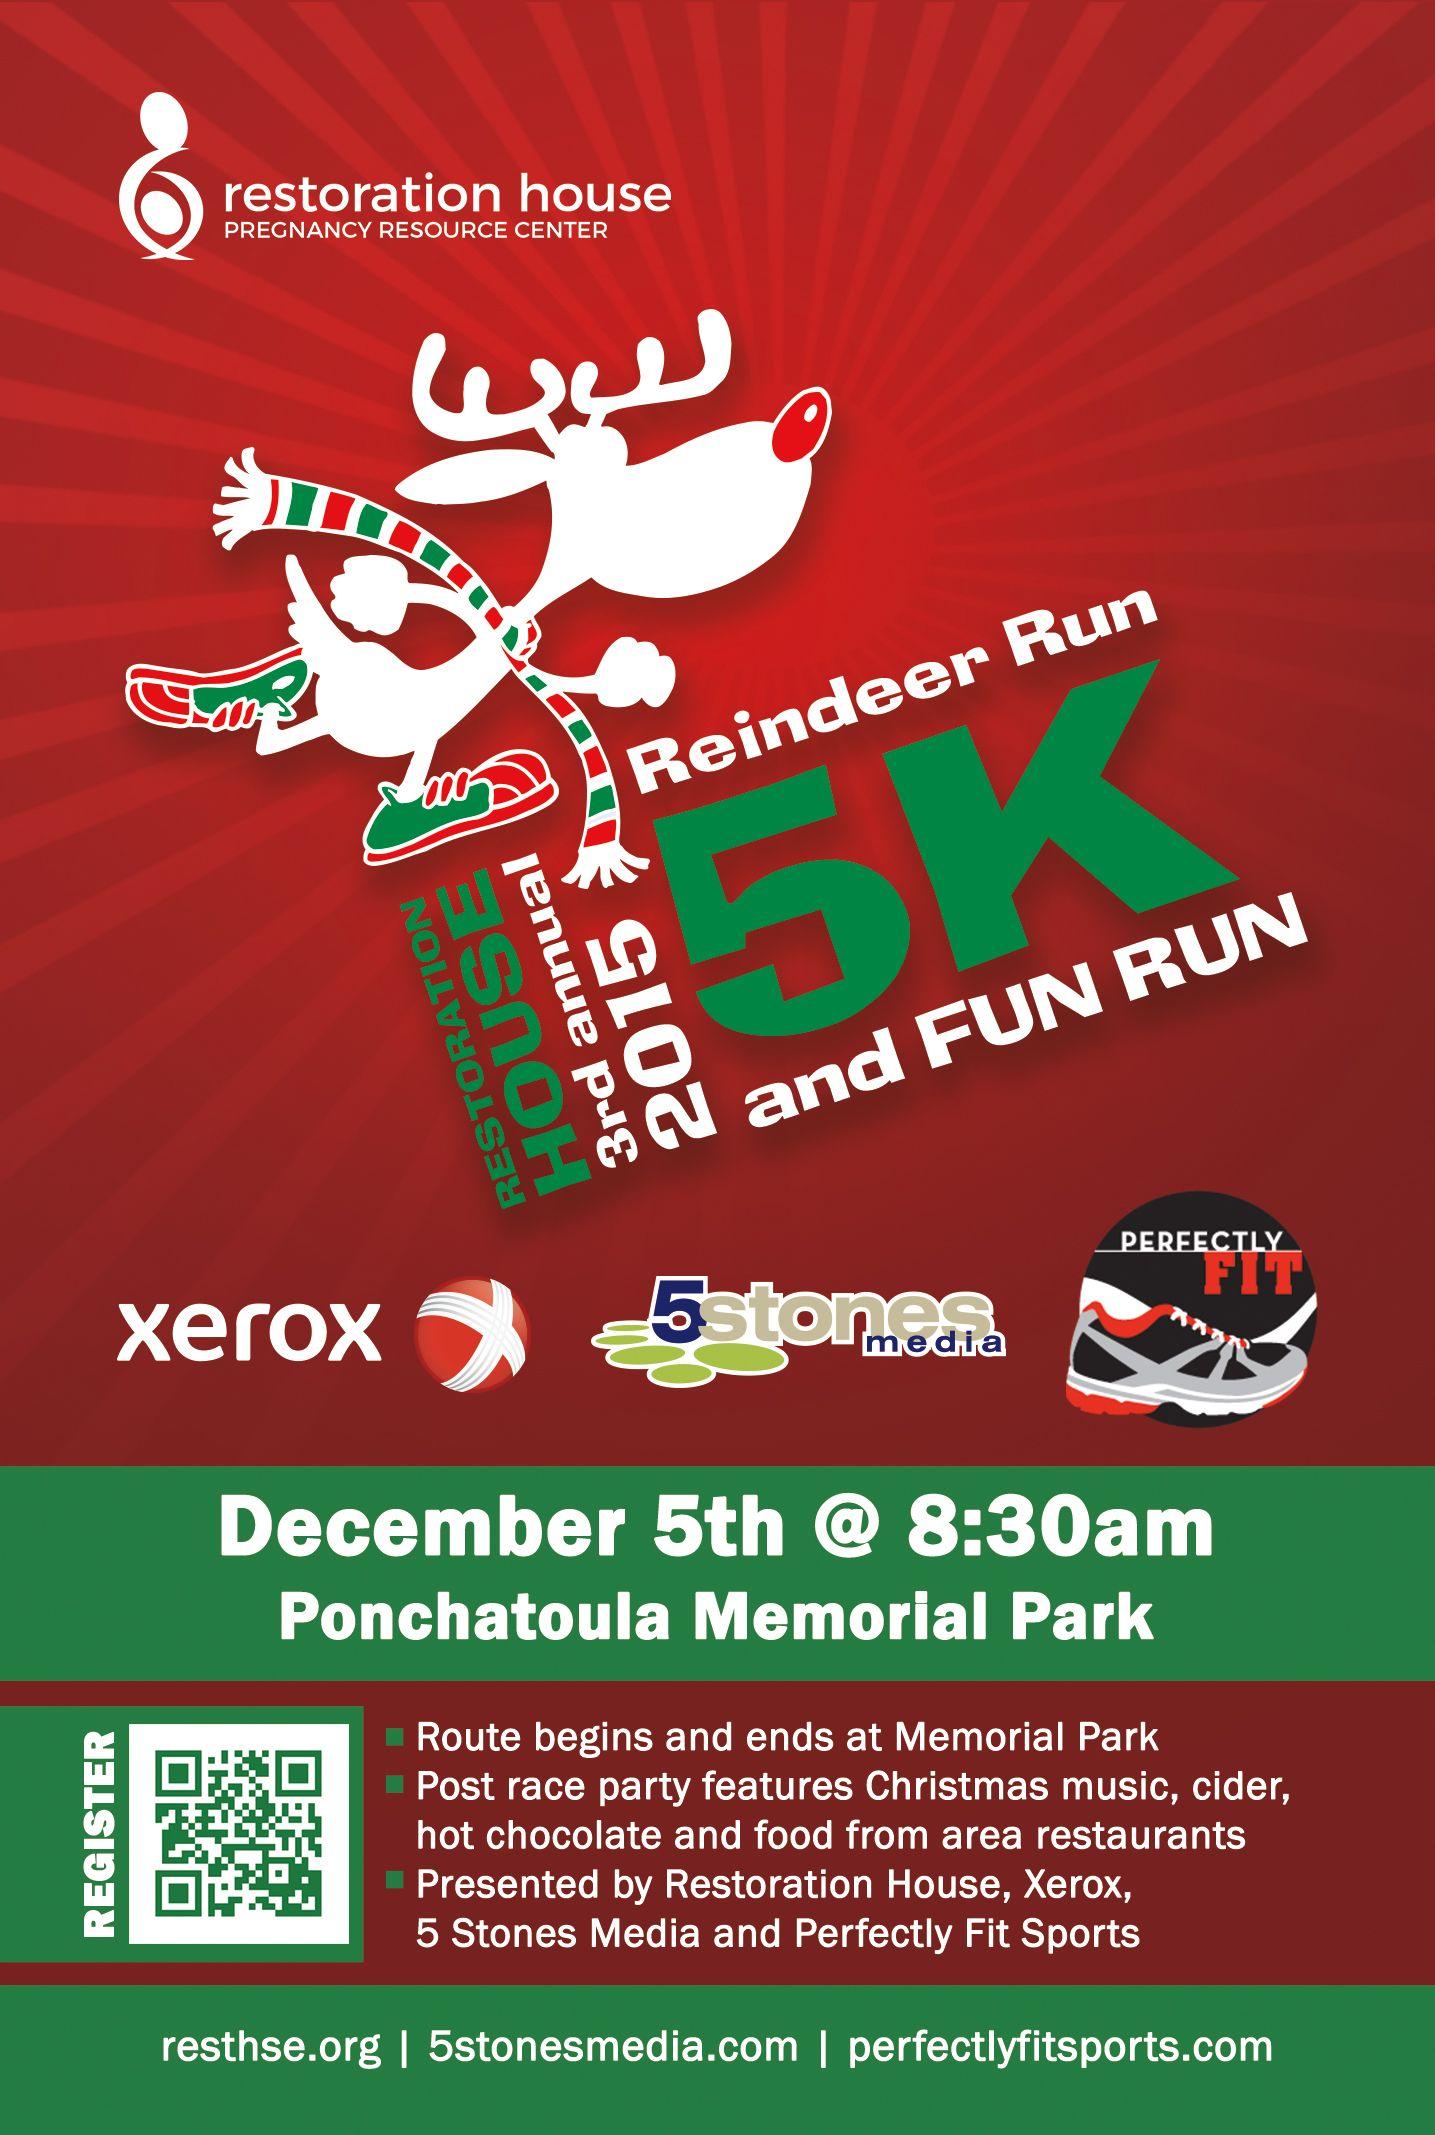 Reindeer Run 2015 Reindeer Run Reindeer Race Party